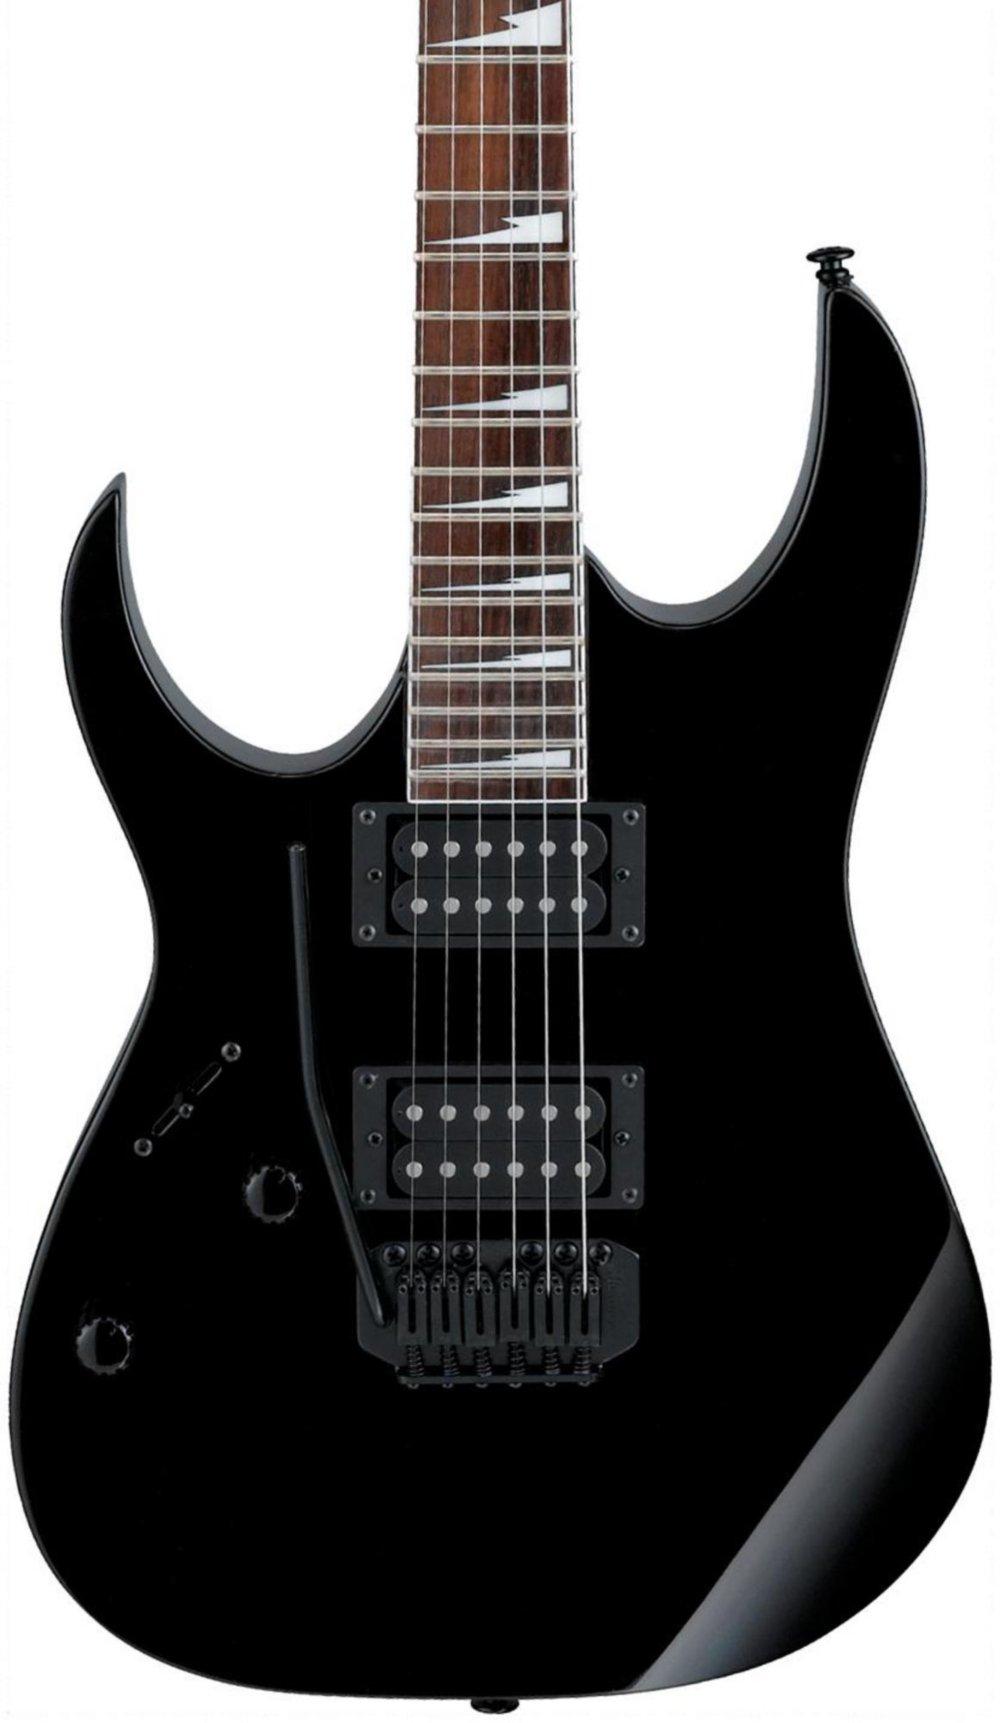 Cheap Ibanez GRG120BDXL Left-Handed Electric Guitar Black Black Friday & Cyber Monday 2019